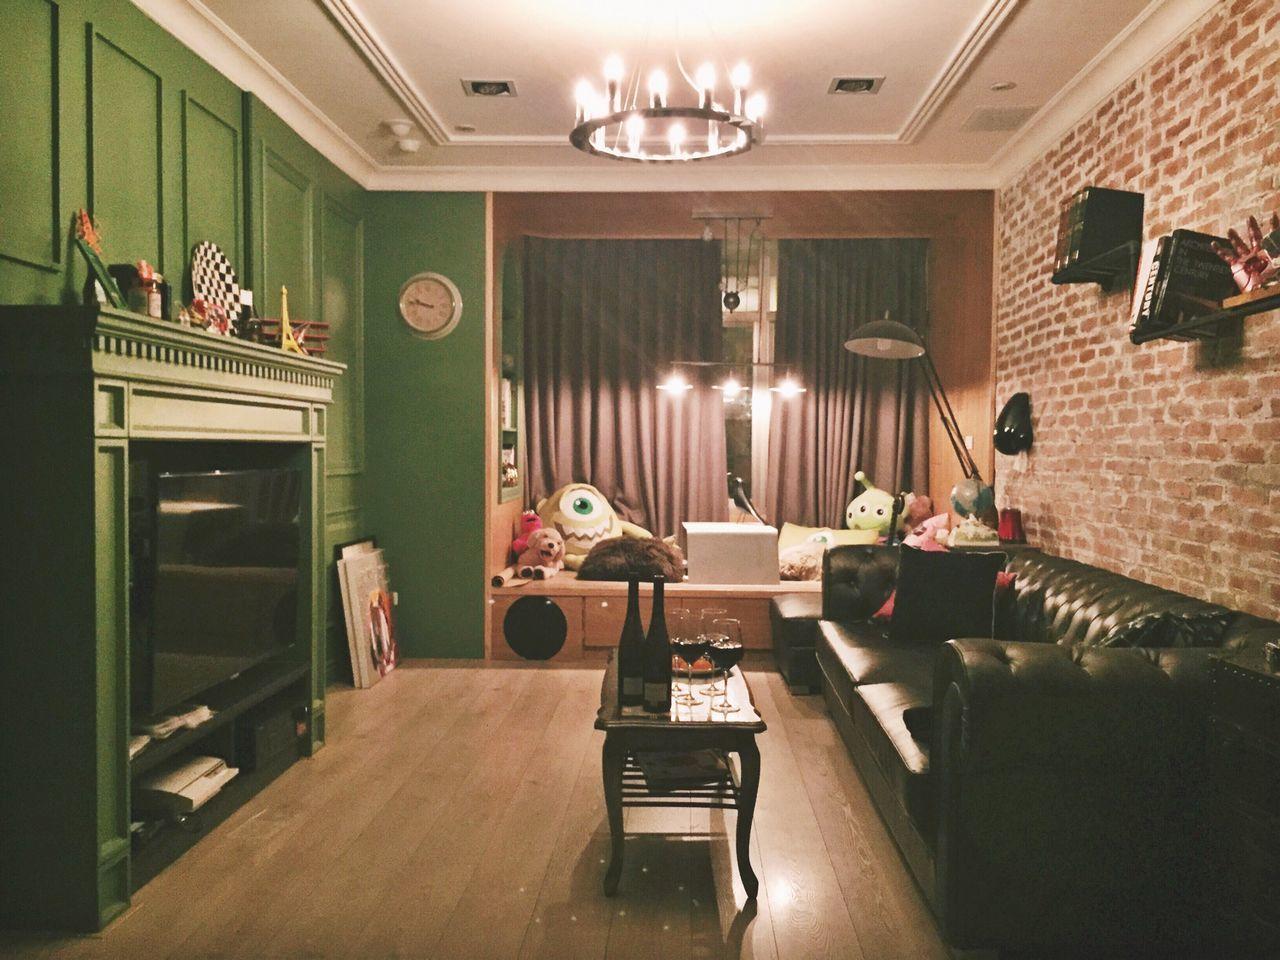 RelaxingHolidayyEyeEm Best ShotssEyeEm Best EditssPartyy2015  InteriorrInterior DesignnHouse Design Party start